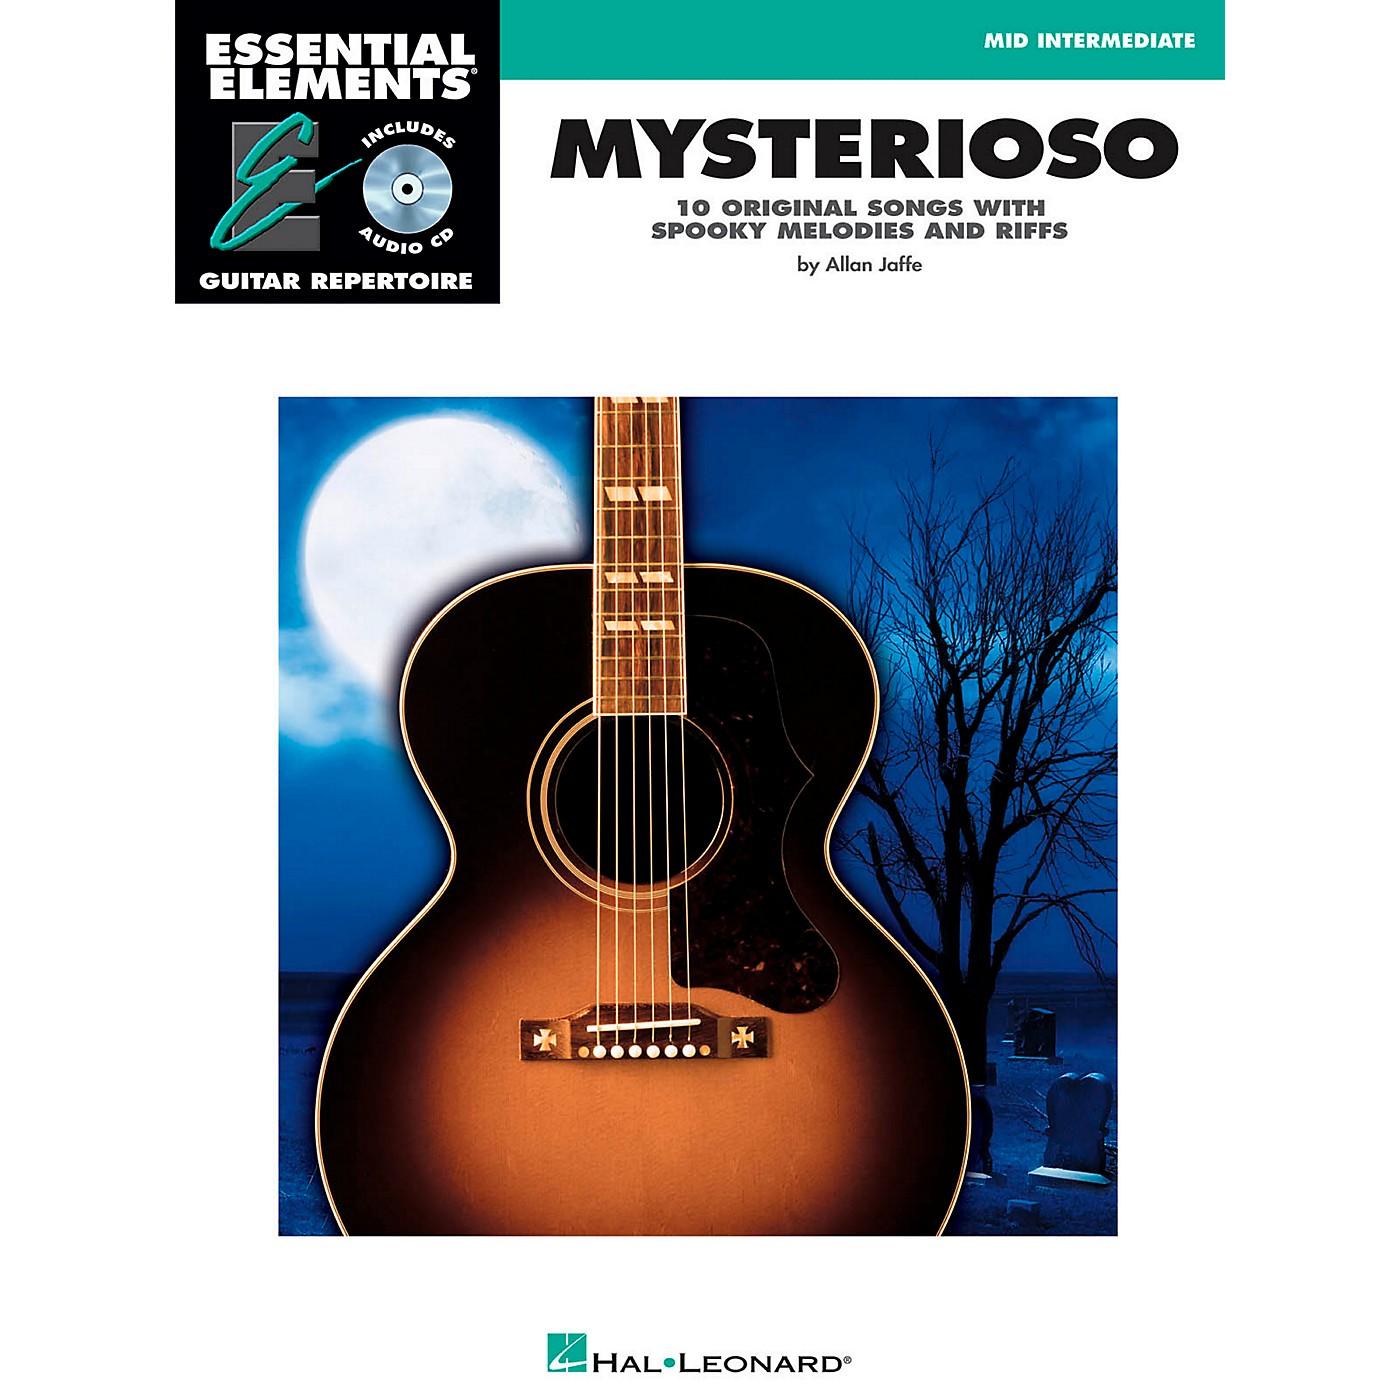 Hal Leonard Mysterioso - Mid Intermediate Essential Elements Guitar Repertoire Book/CD thumbnail